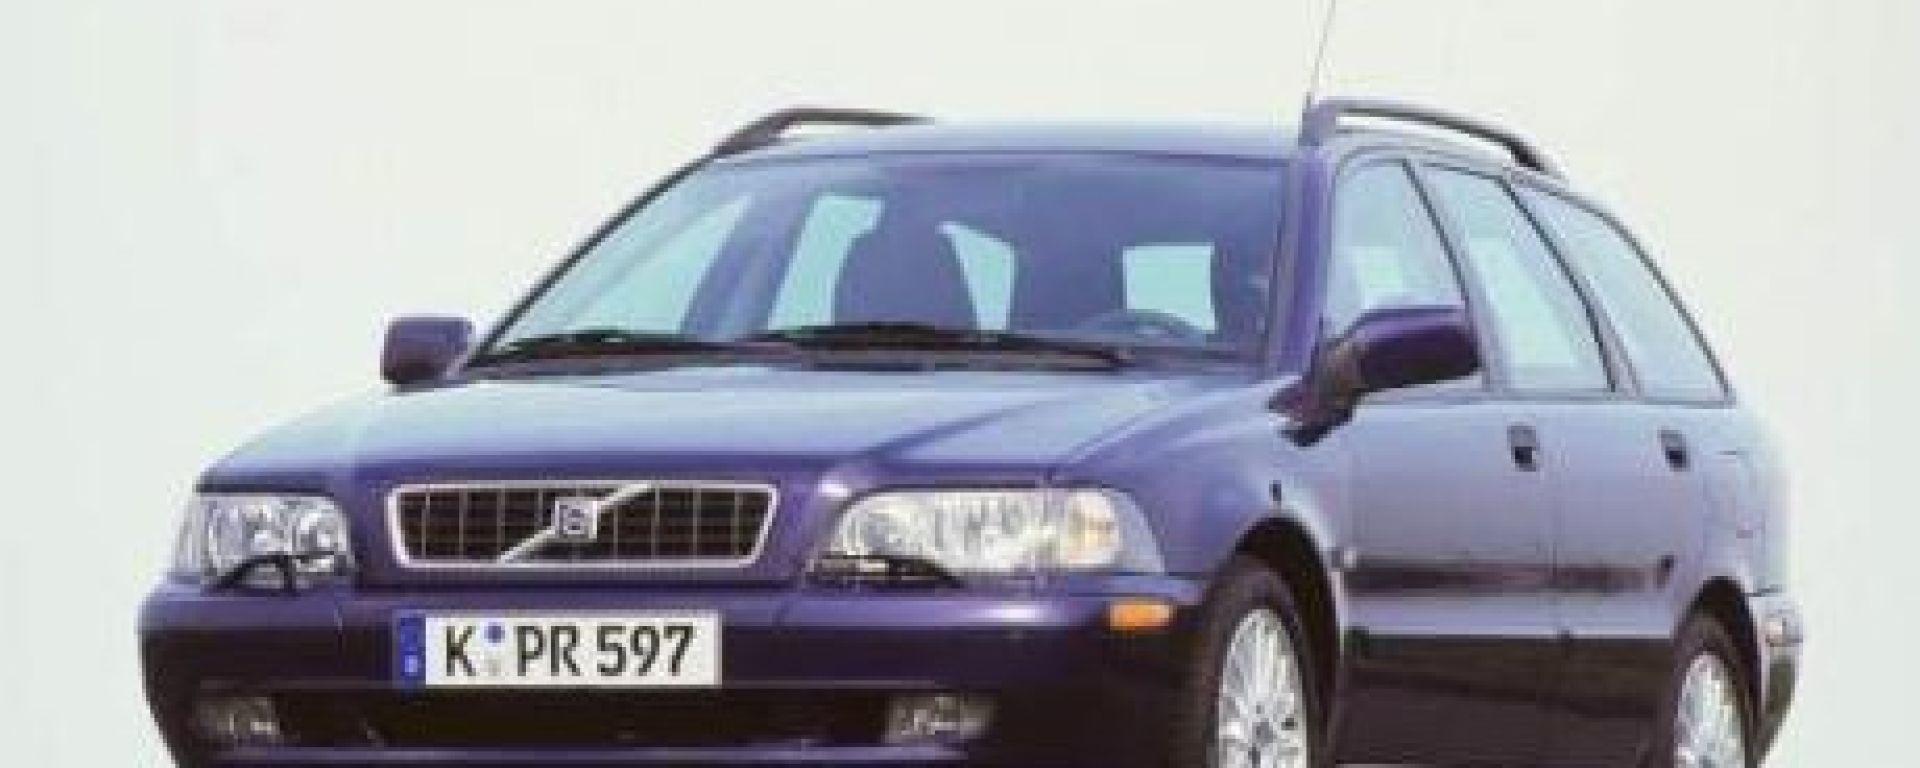 Volvo Serie 40 my 2000